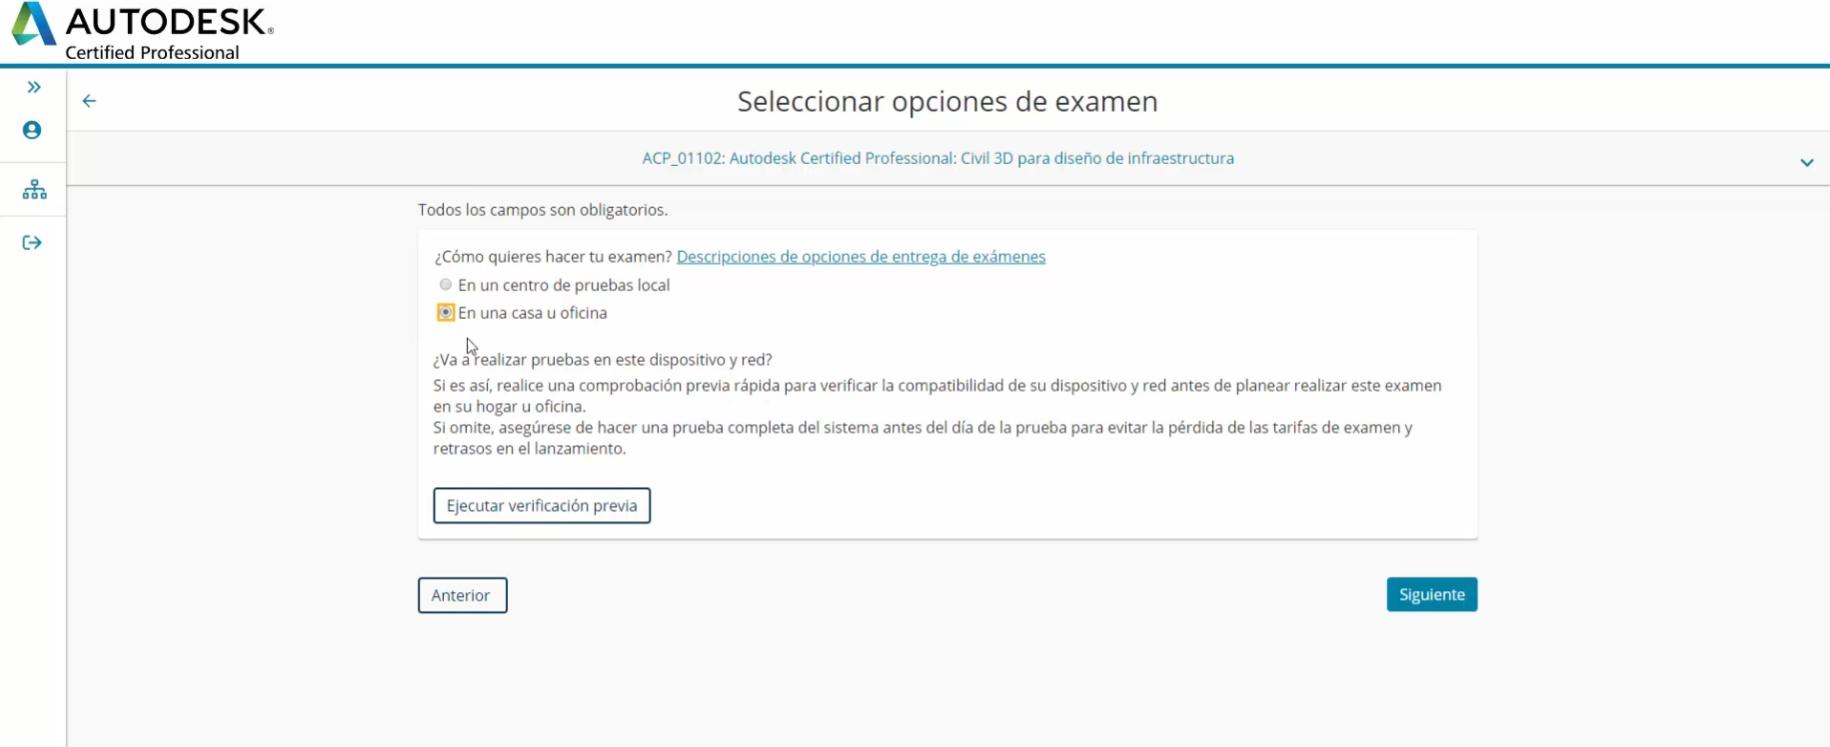 autodesk-certificado-guia-1